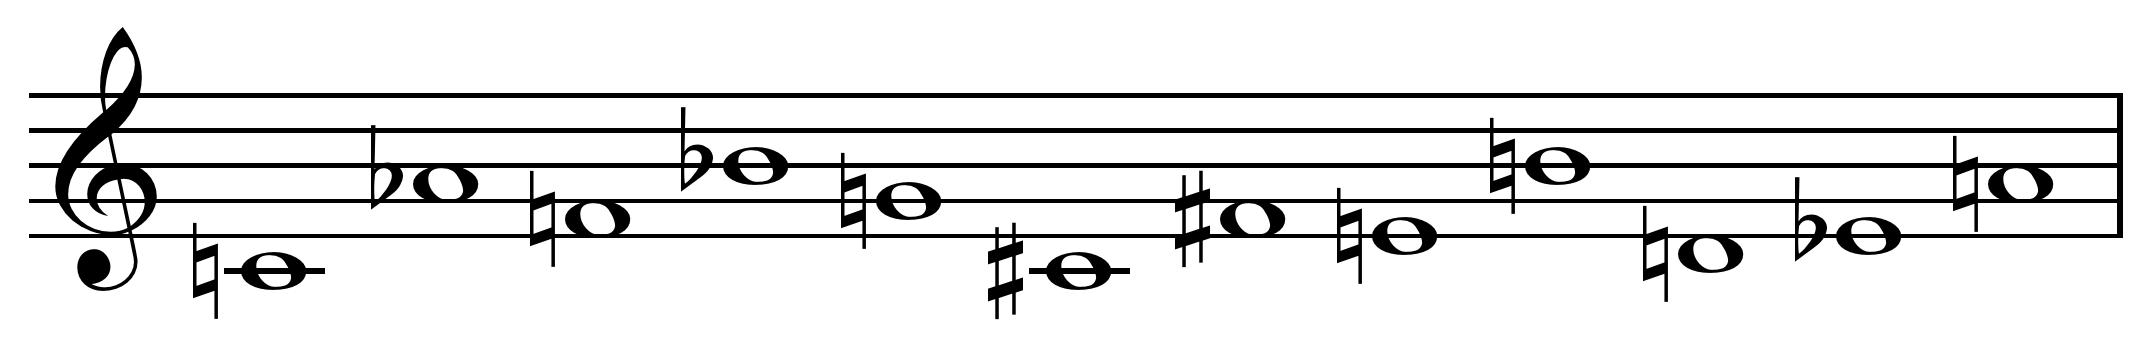 File:Berg - Lulu Alwa tone row.png - Row PNG